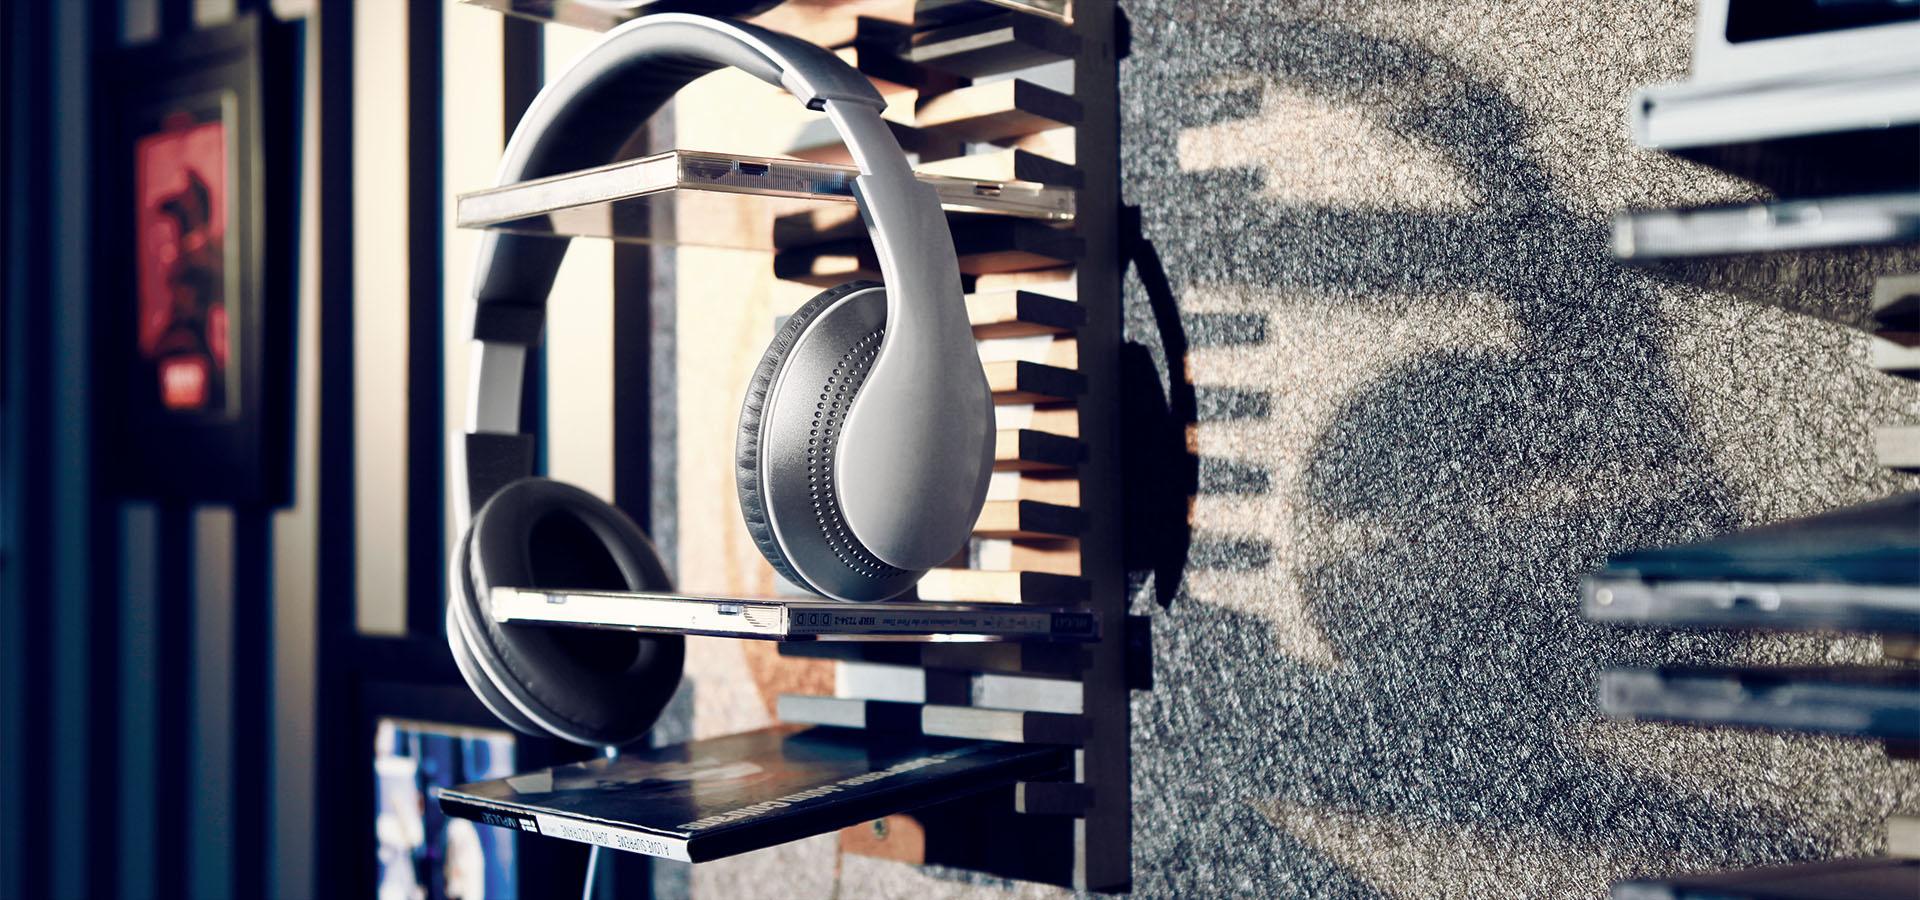 Bluetooth gaming headphones - gaming headphones removable mic